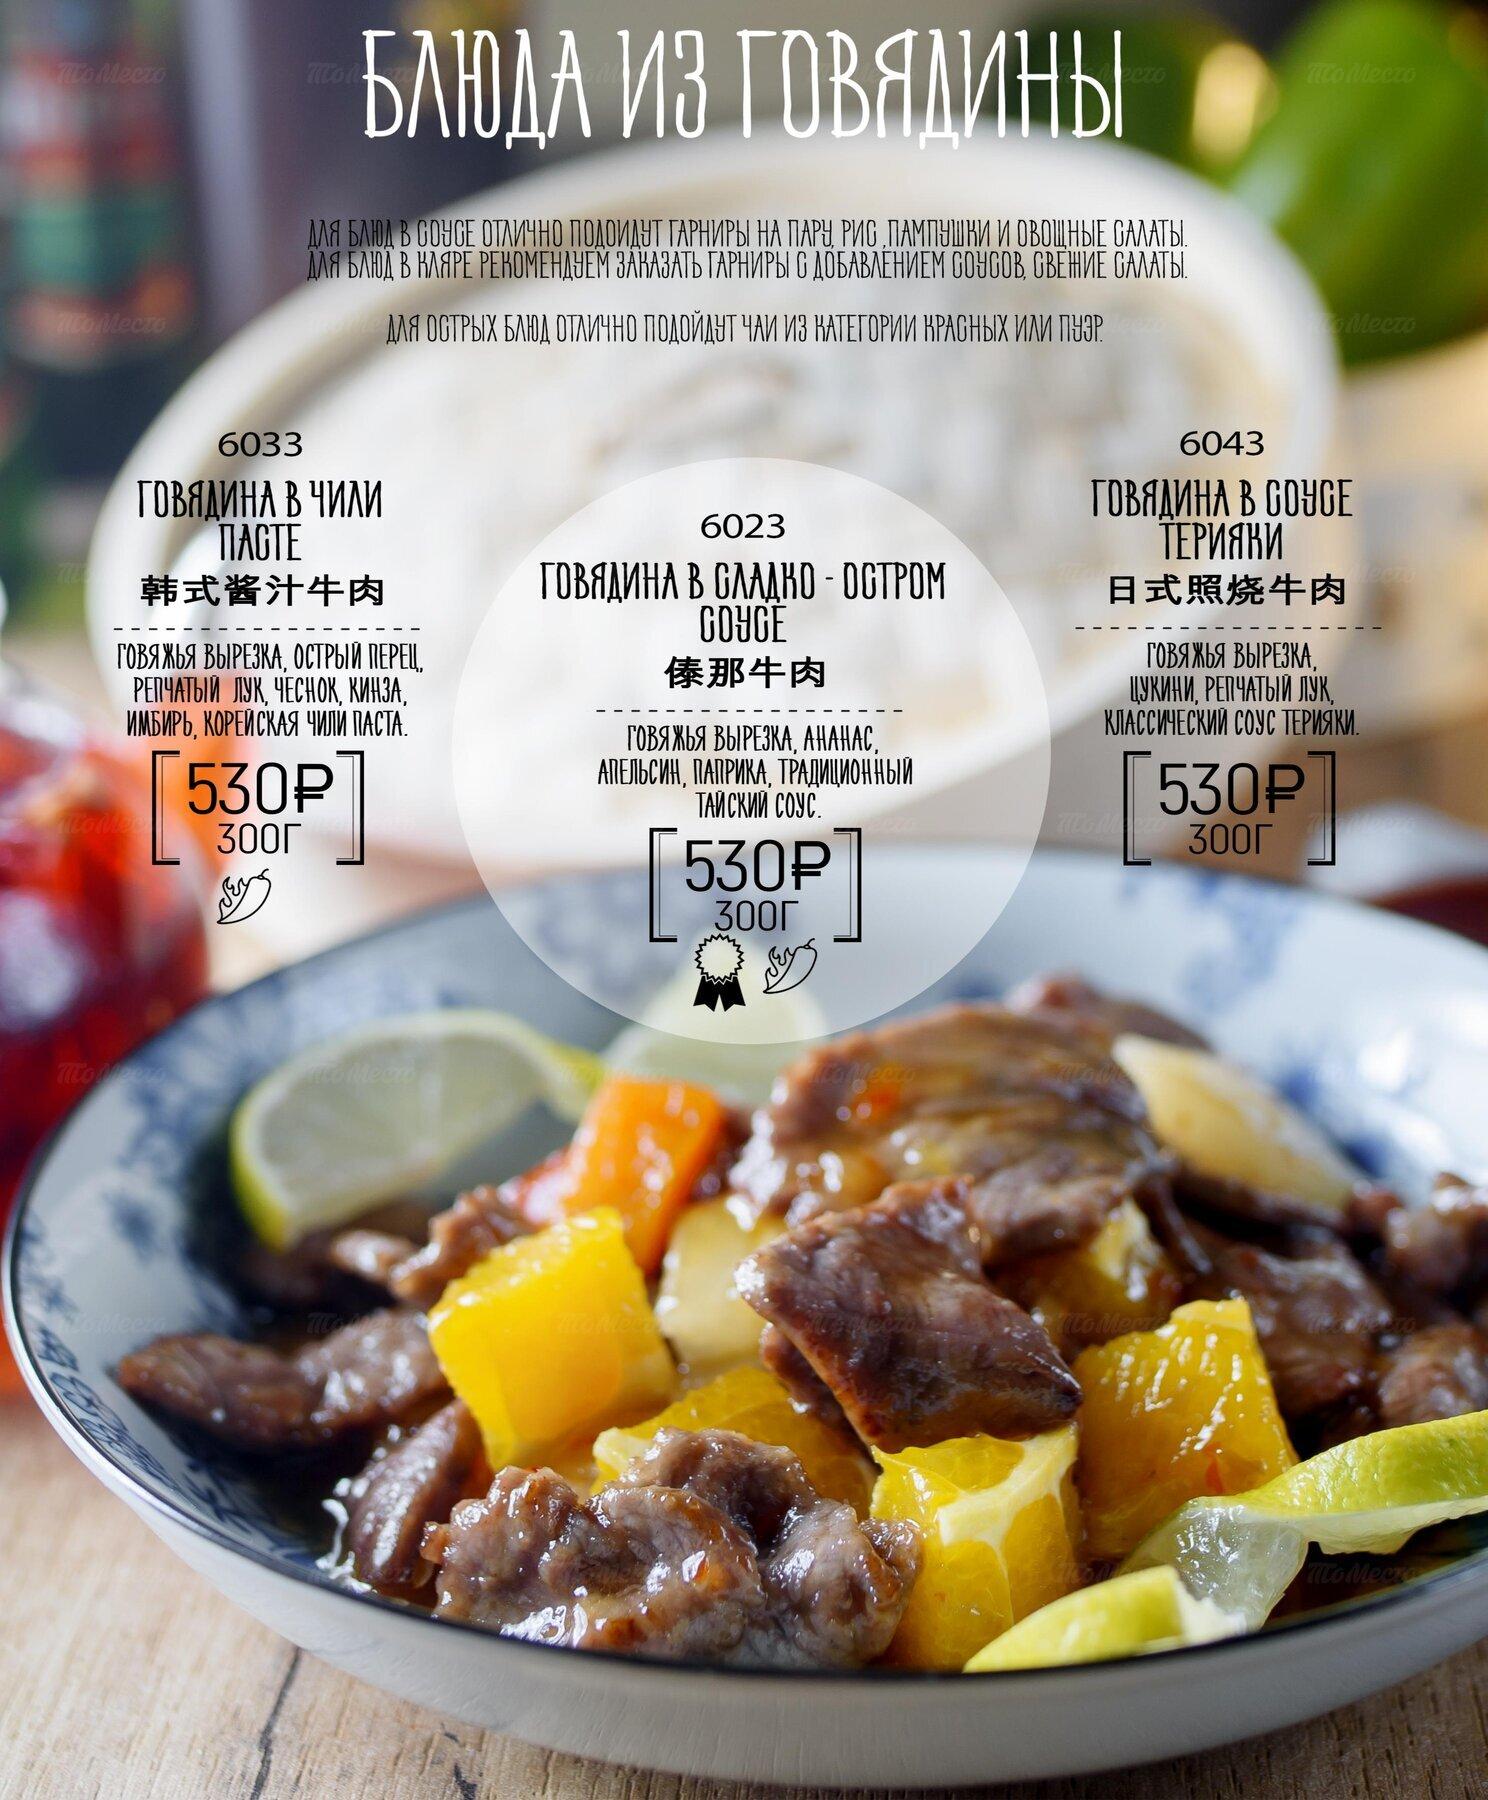 Меню ресторана Цзао Ван на Перекопской фото 20